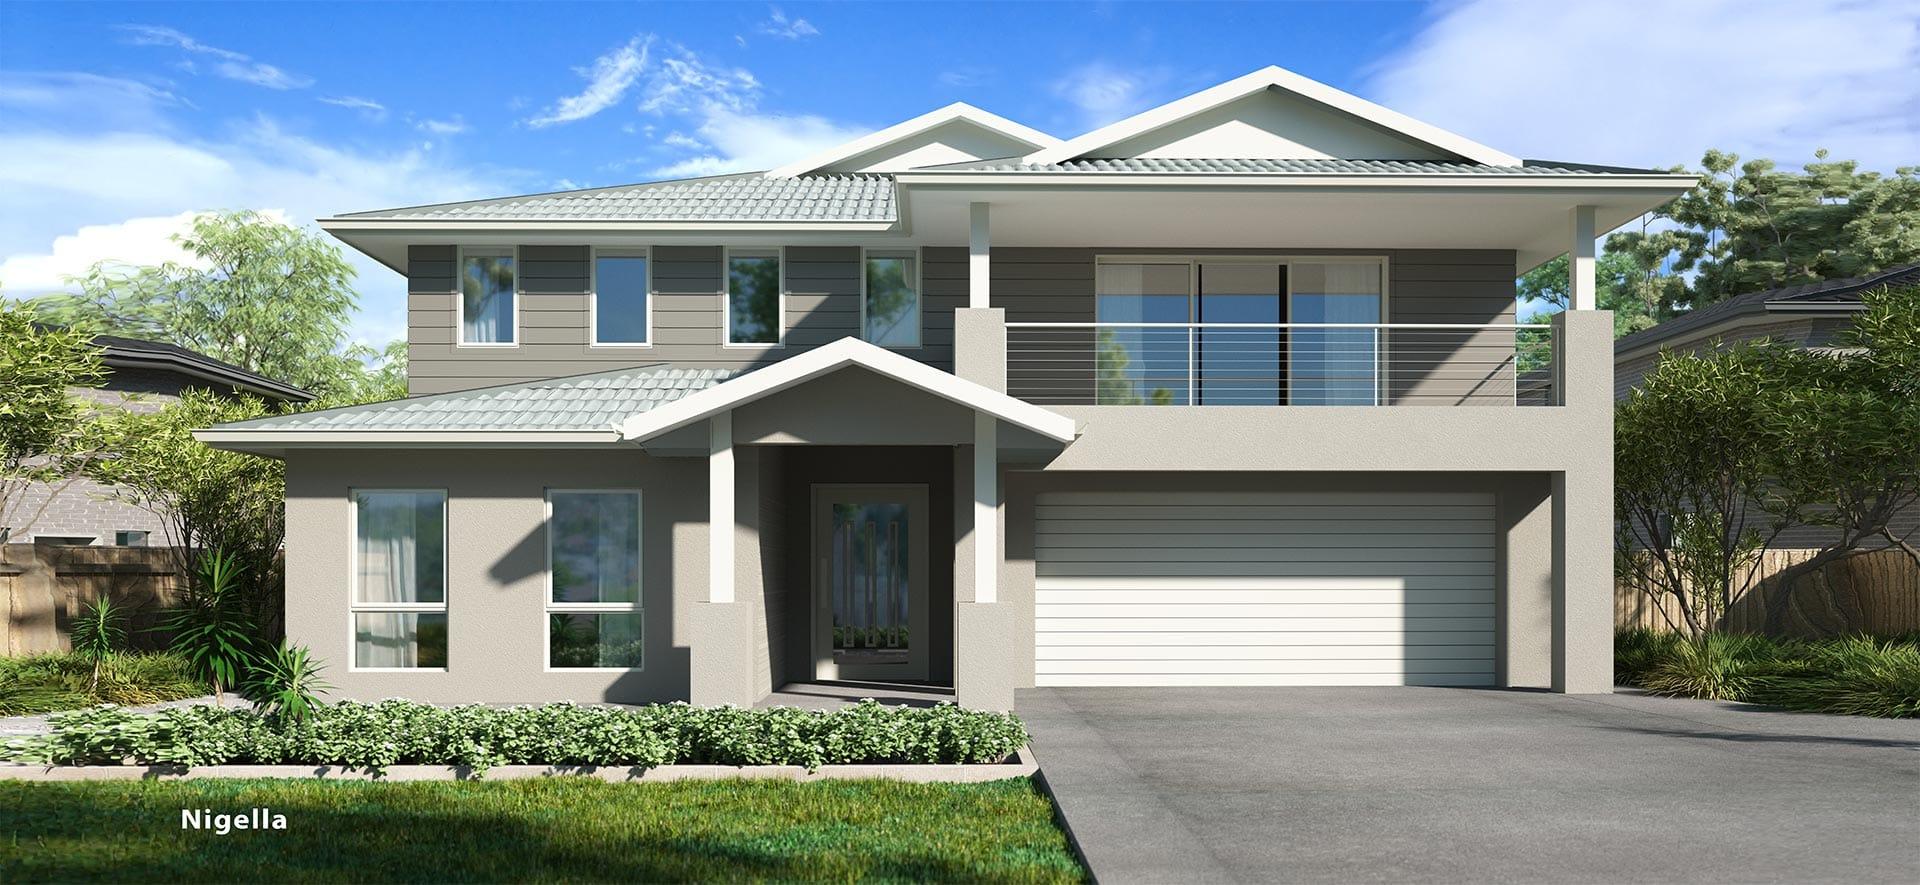 Nigella Double House Design